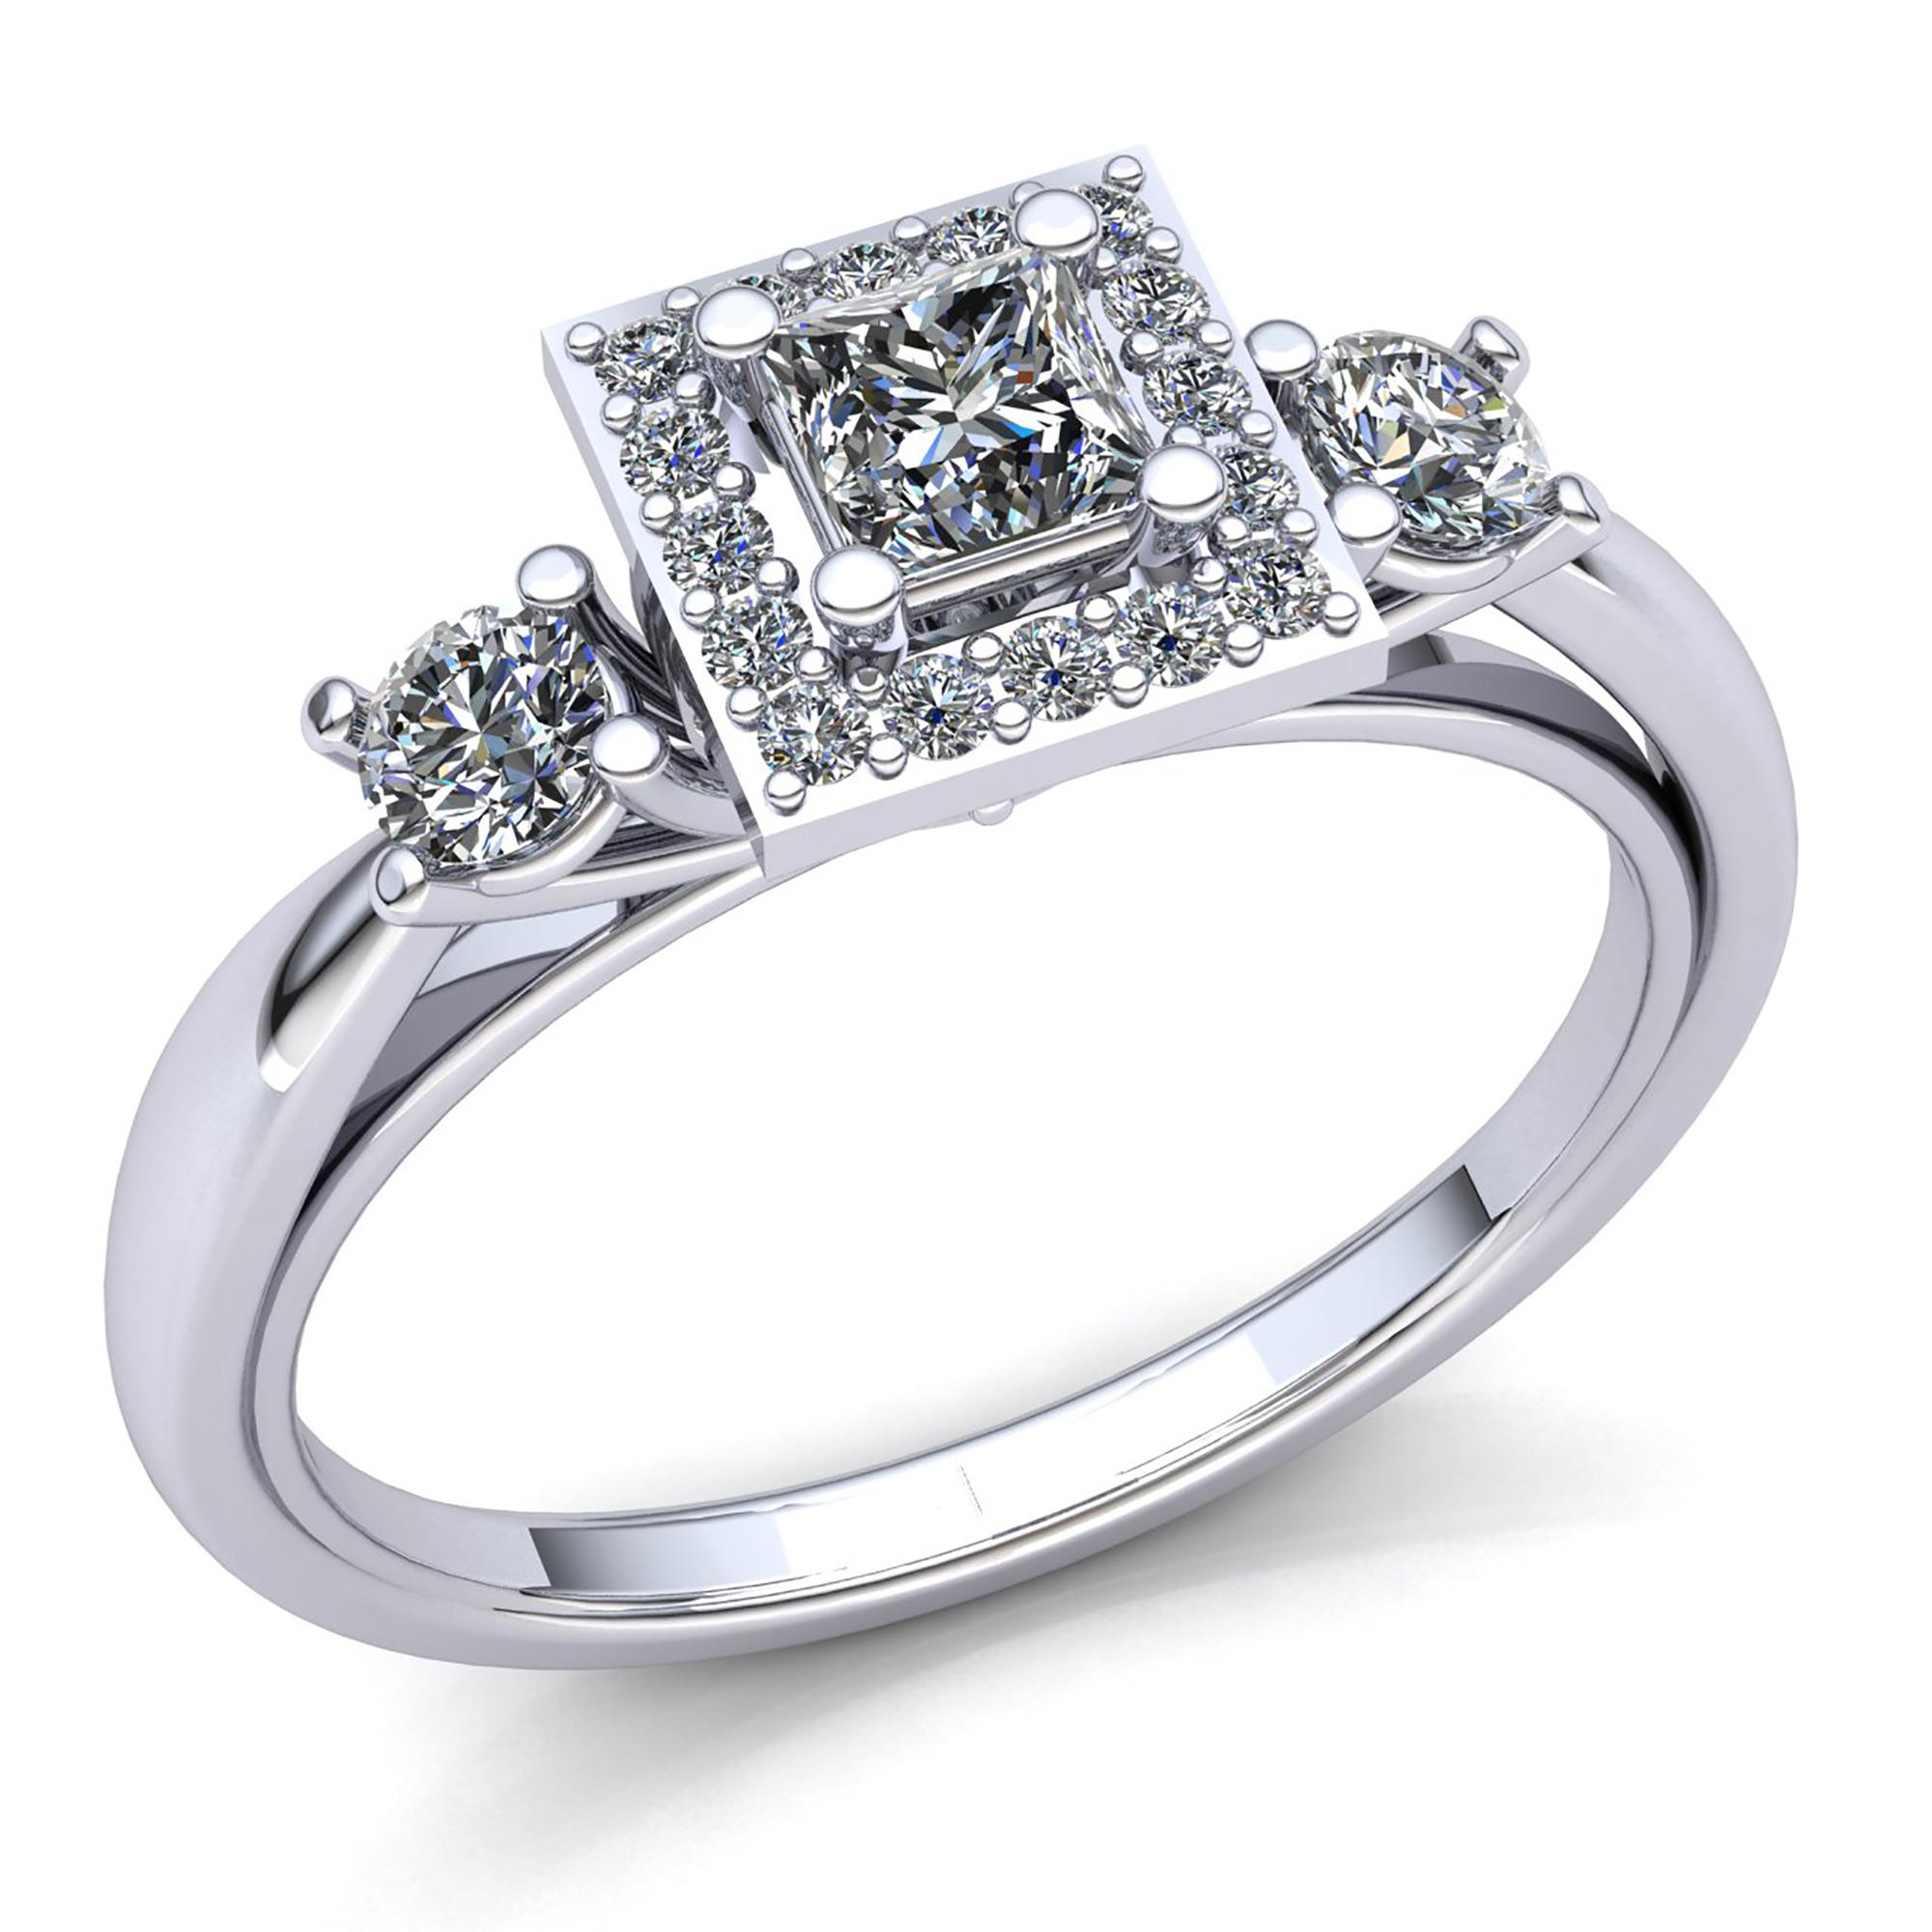 0 75ct Princess Cut Diamond Ladies Square Halo 3stone Engagement Ring 10k Gold Ebay